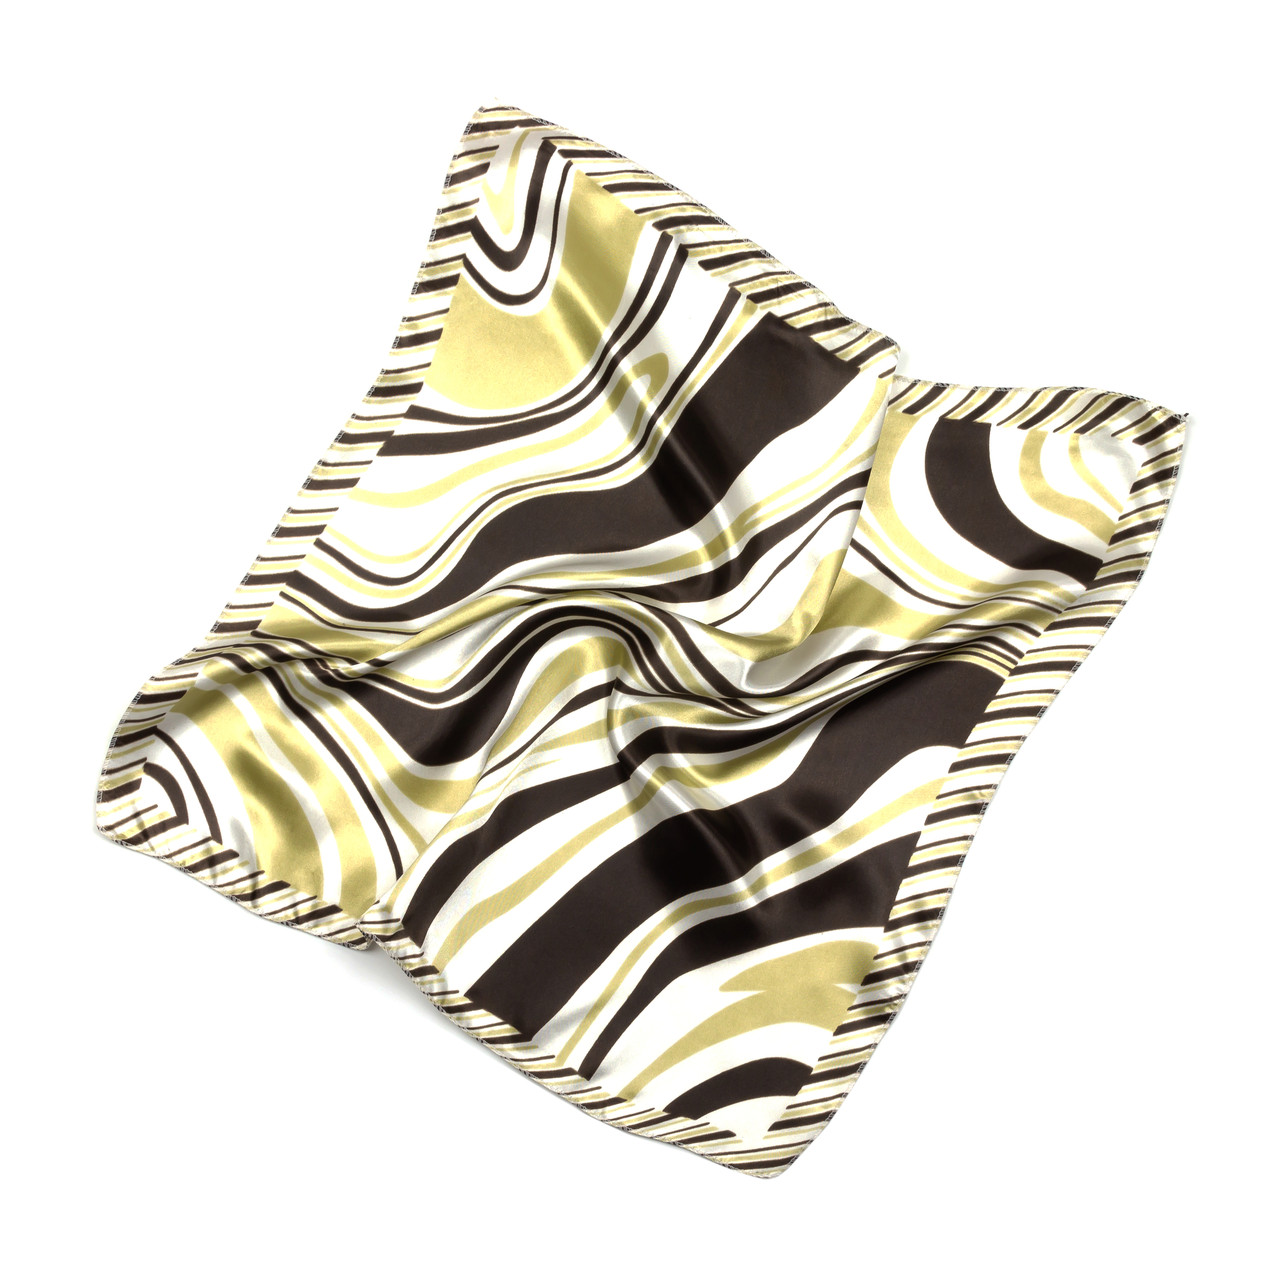 Платок шейный из шелка бежево-черный (Ш-509-4)